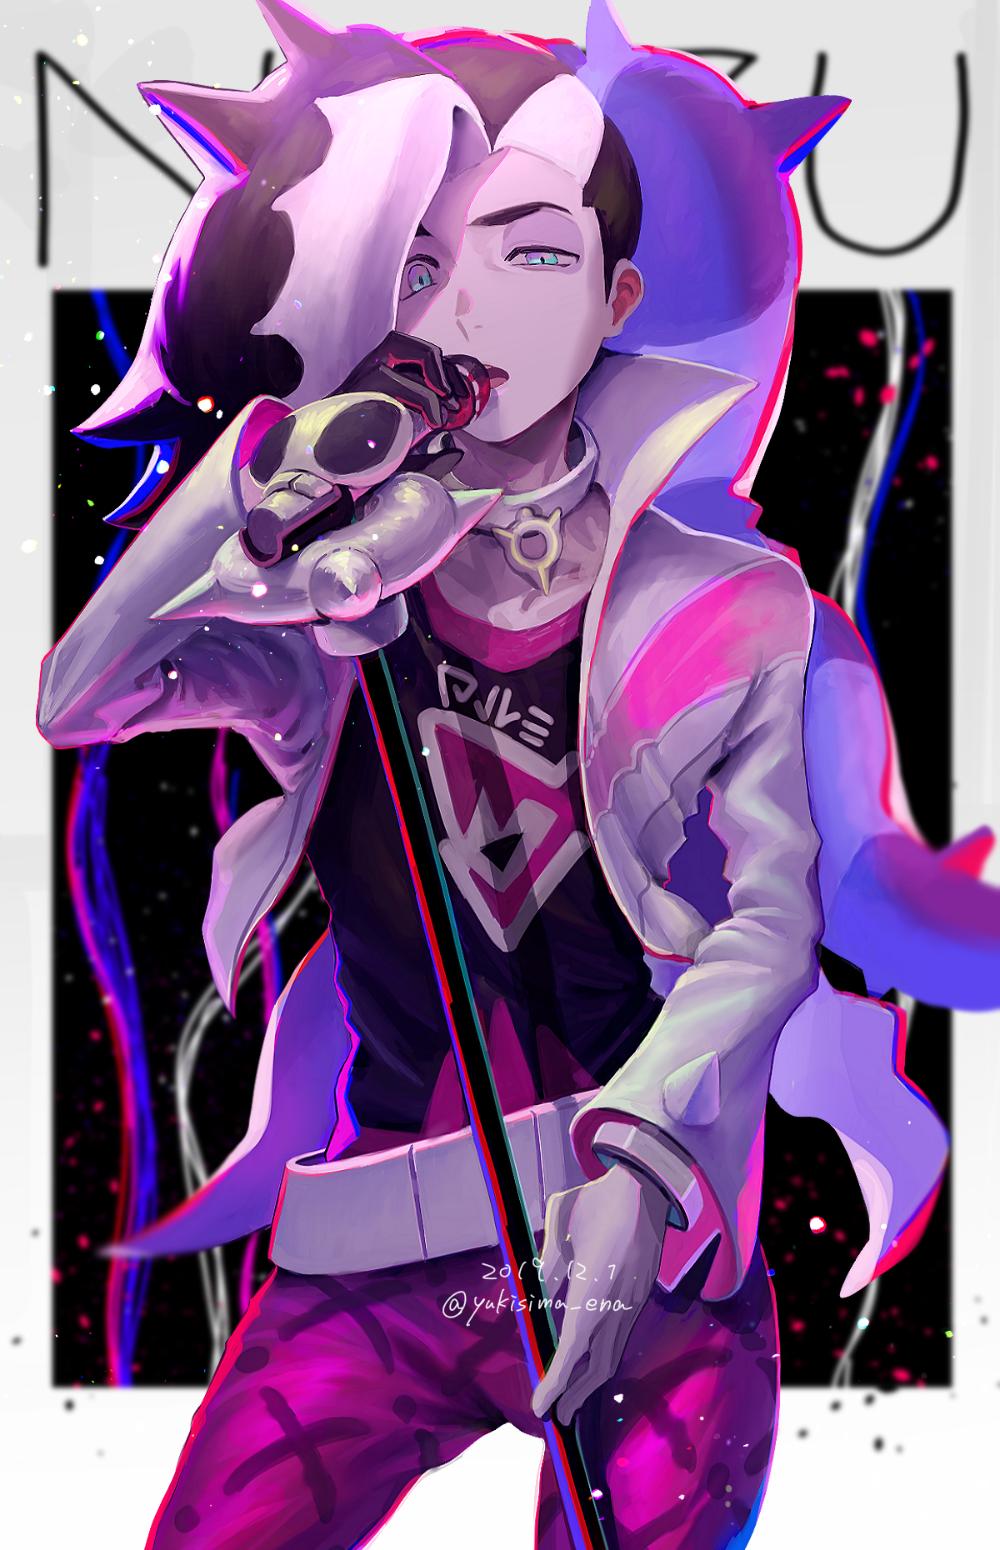 Pokémon (Anime) Image #3439830 - Zerochan Anime Image Board